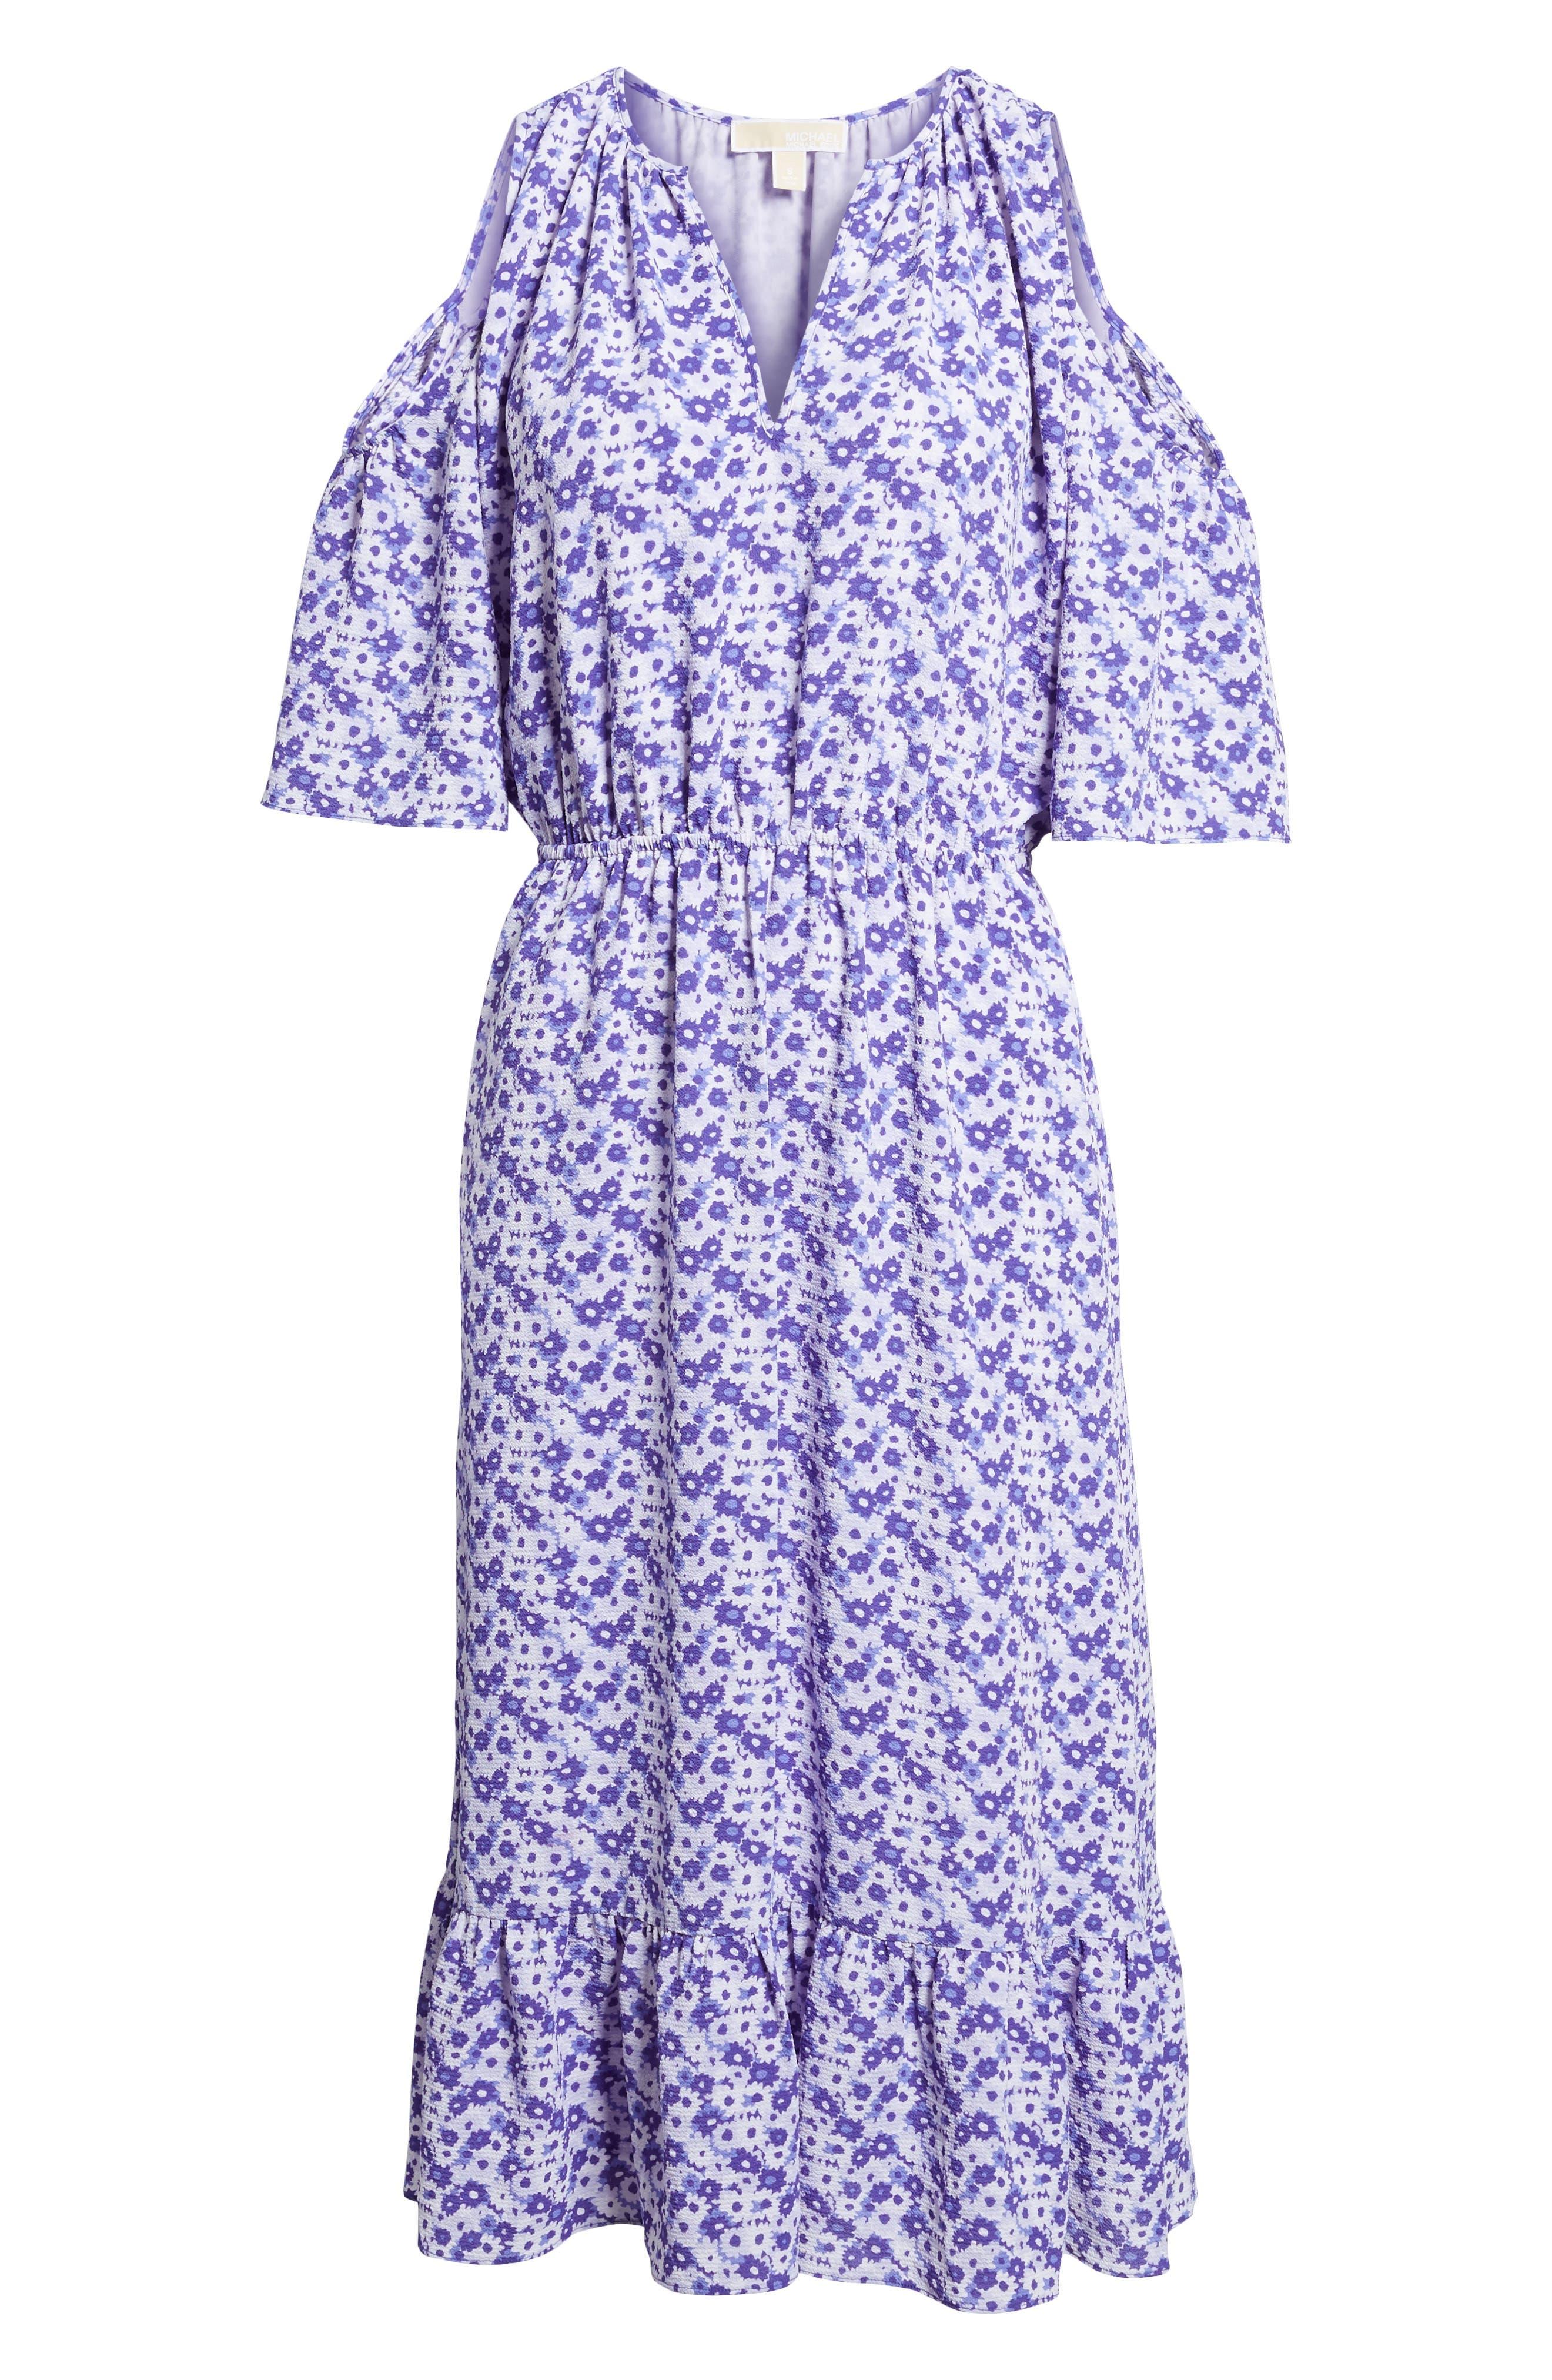 Ruffle Cold Shoulder Dress,                             Alternate thumbnail 6, color,                             580